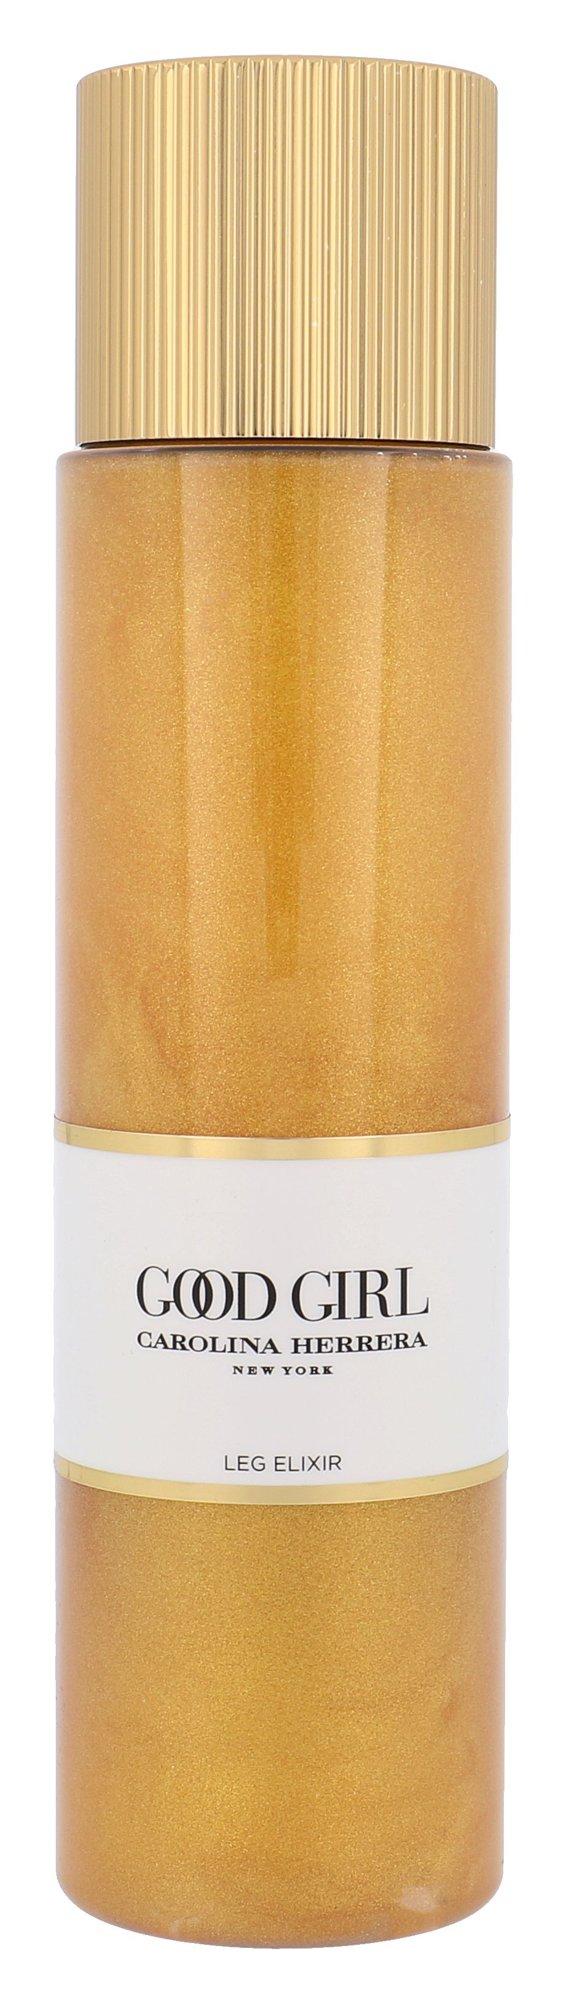 Carolina Herrera Good Girl Perfumed Oil for Legs 200ml